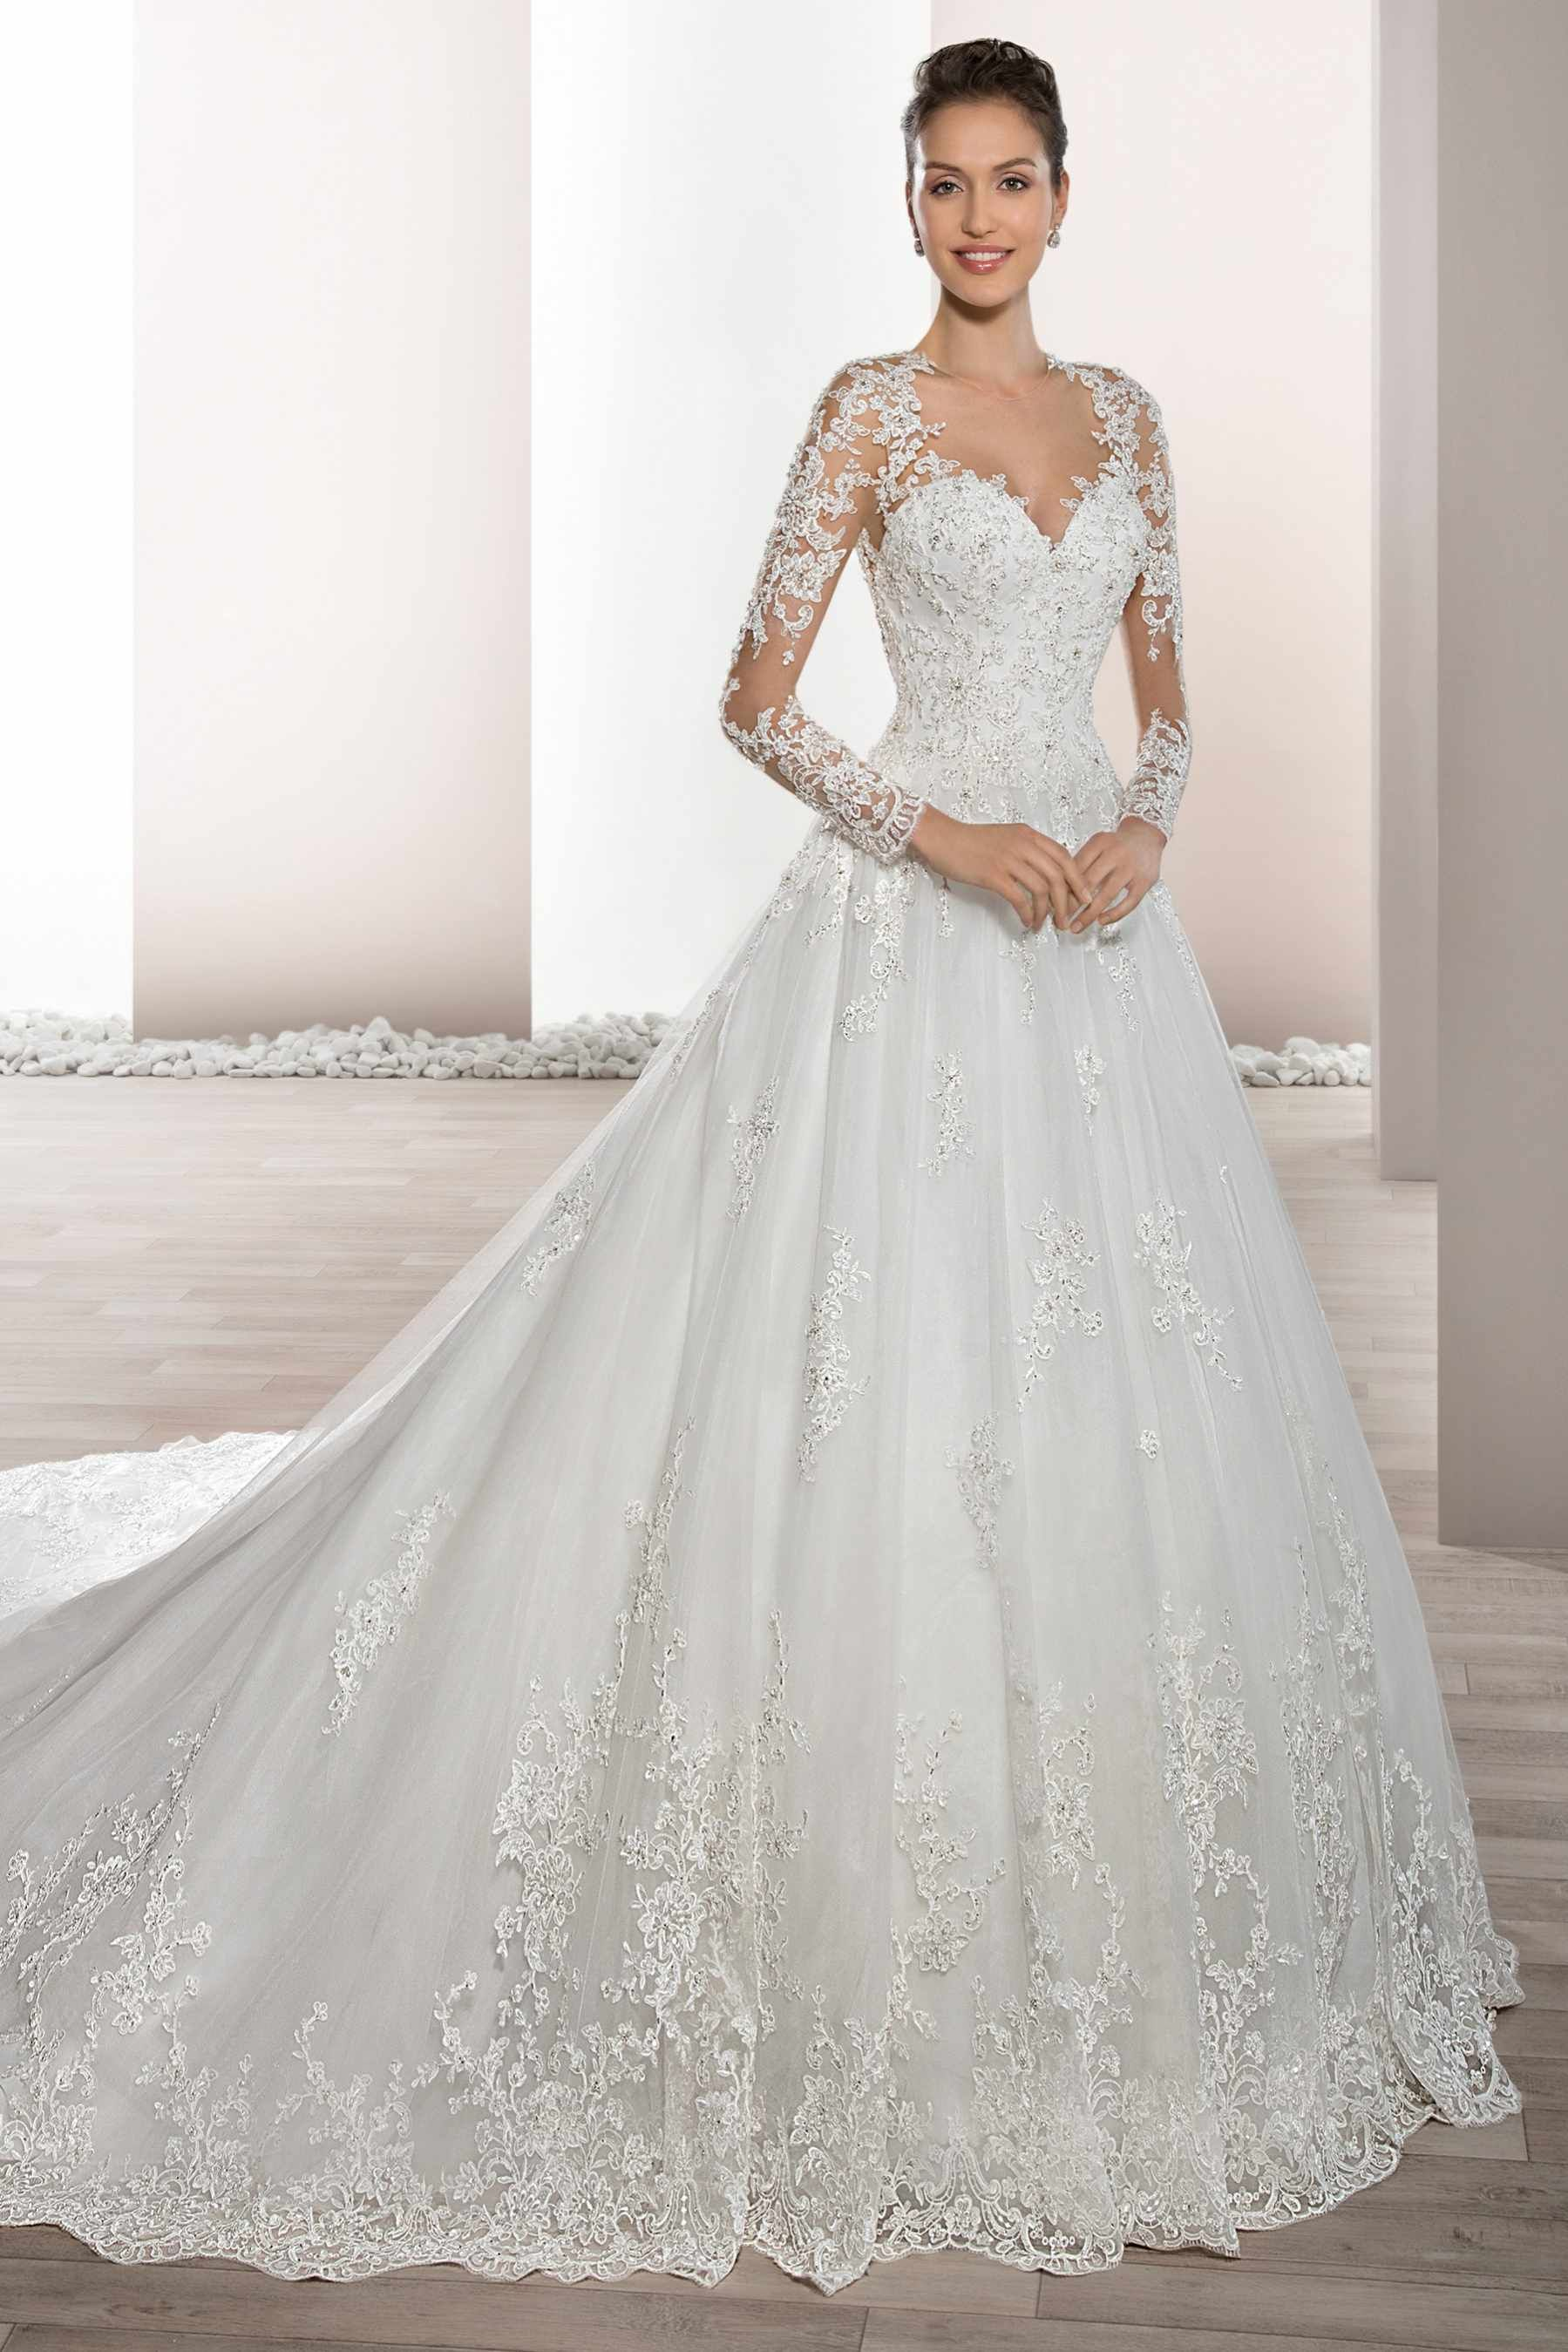 Demetrios Wedding Dress Style 732 Demetrios Wedding Dress Ball Gowns Wedding Embroidered Wedding Dress